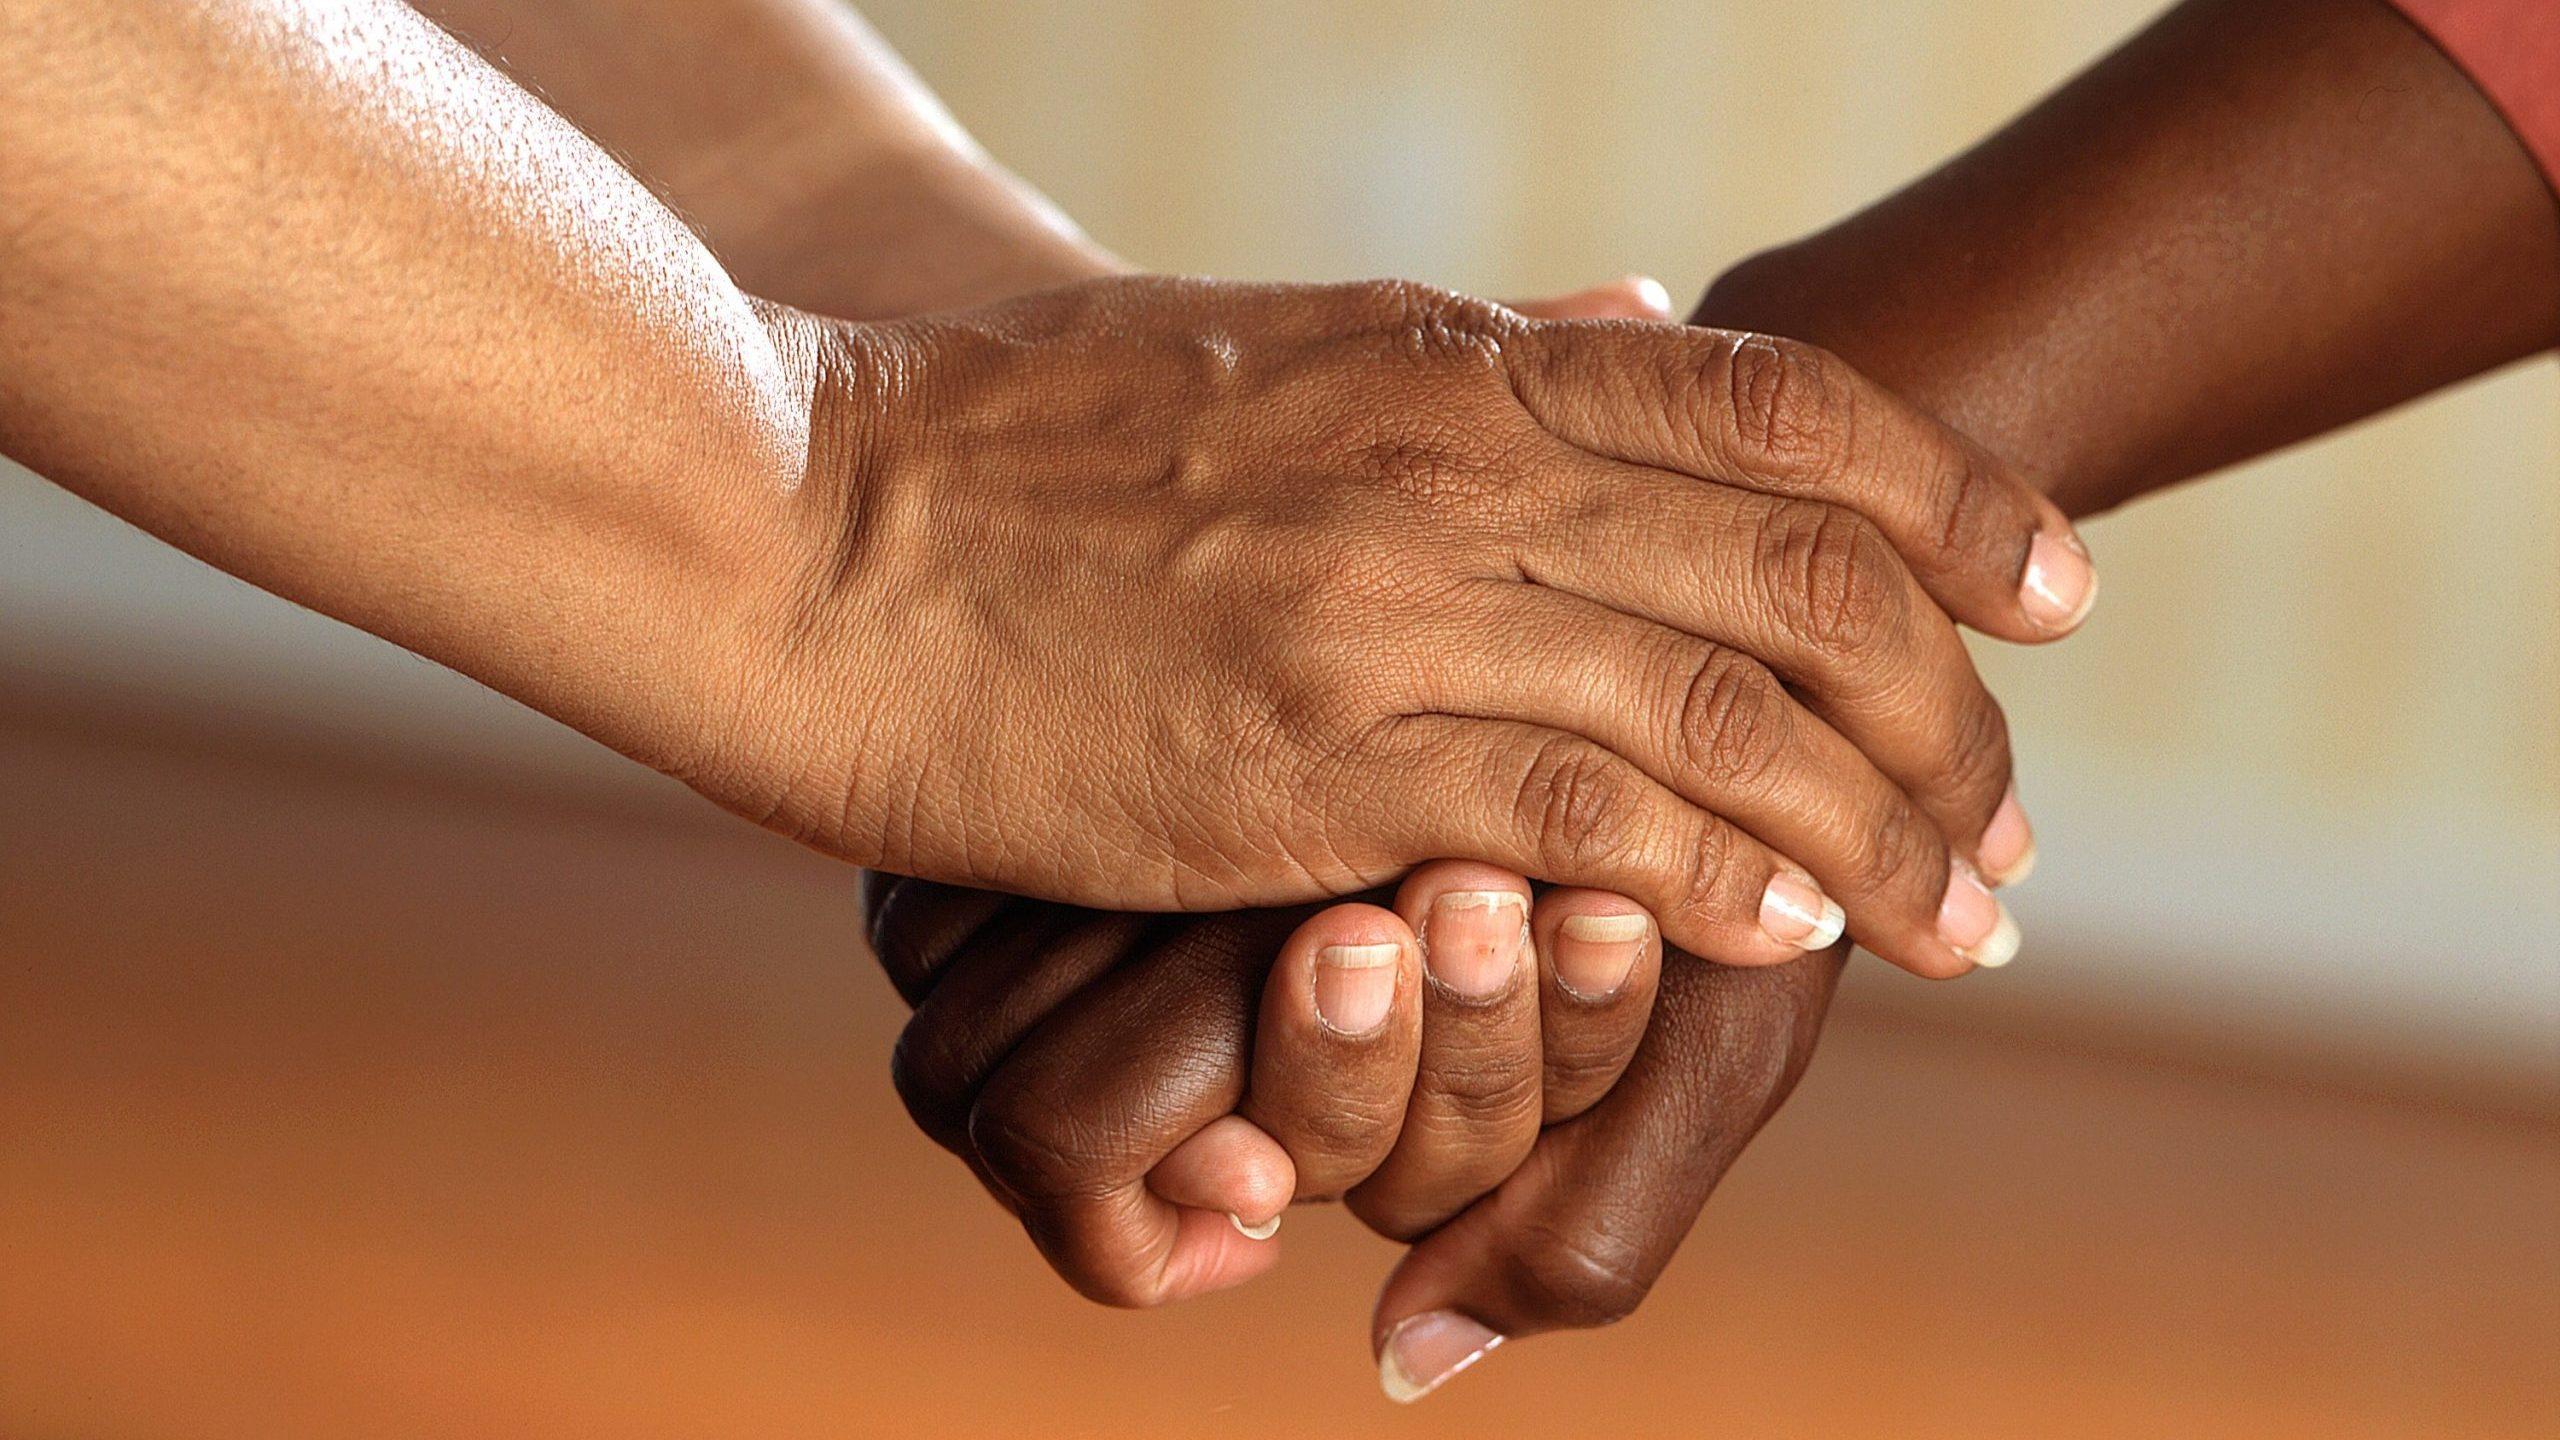 Support for stroke survivors